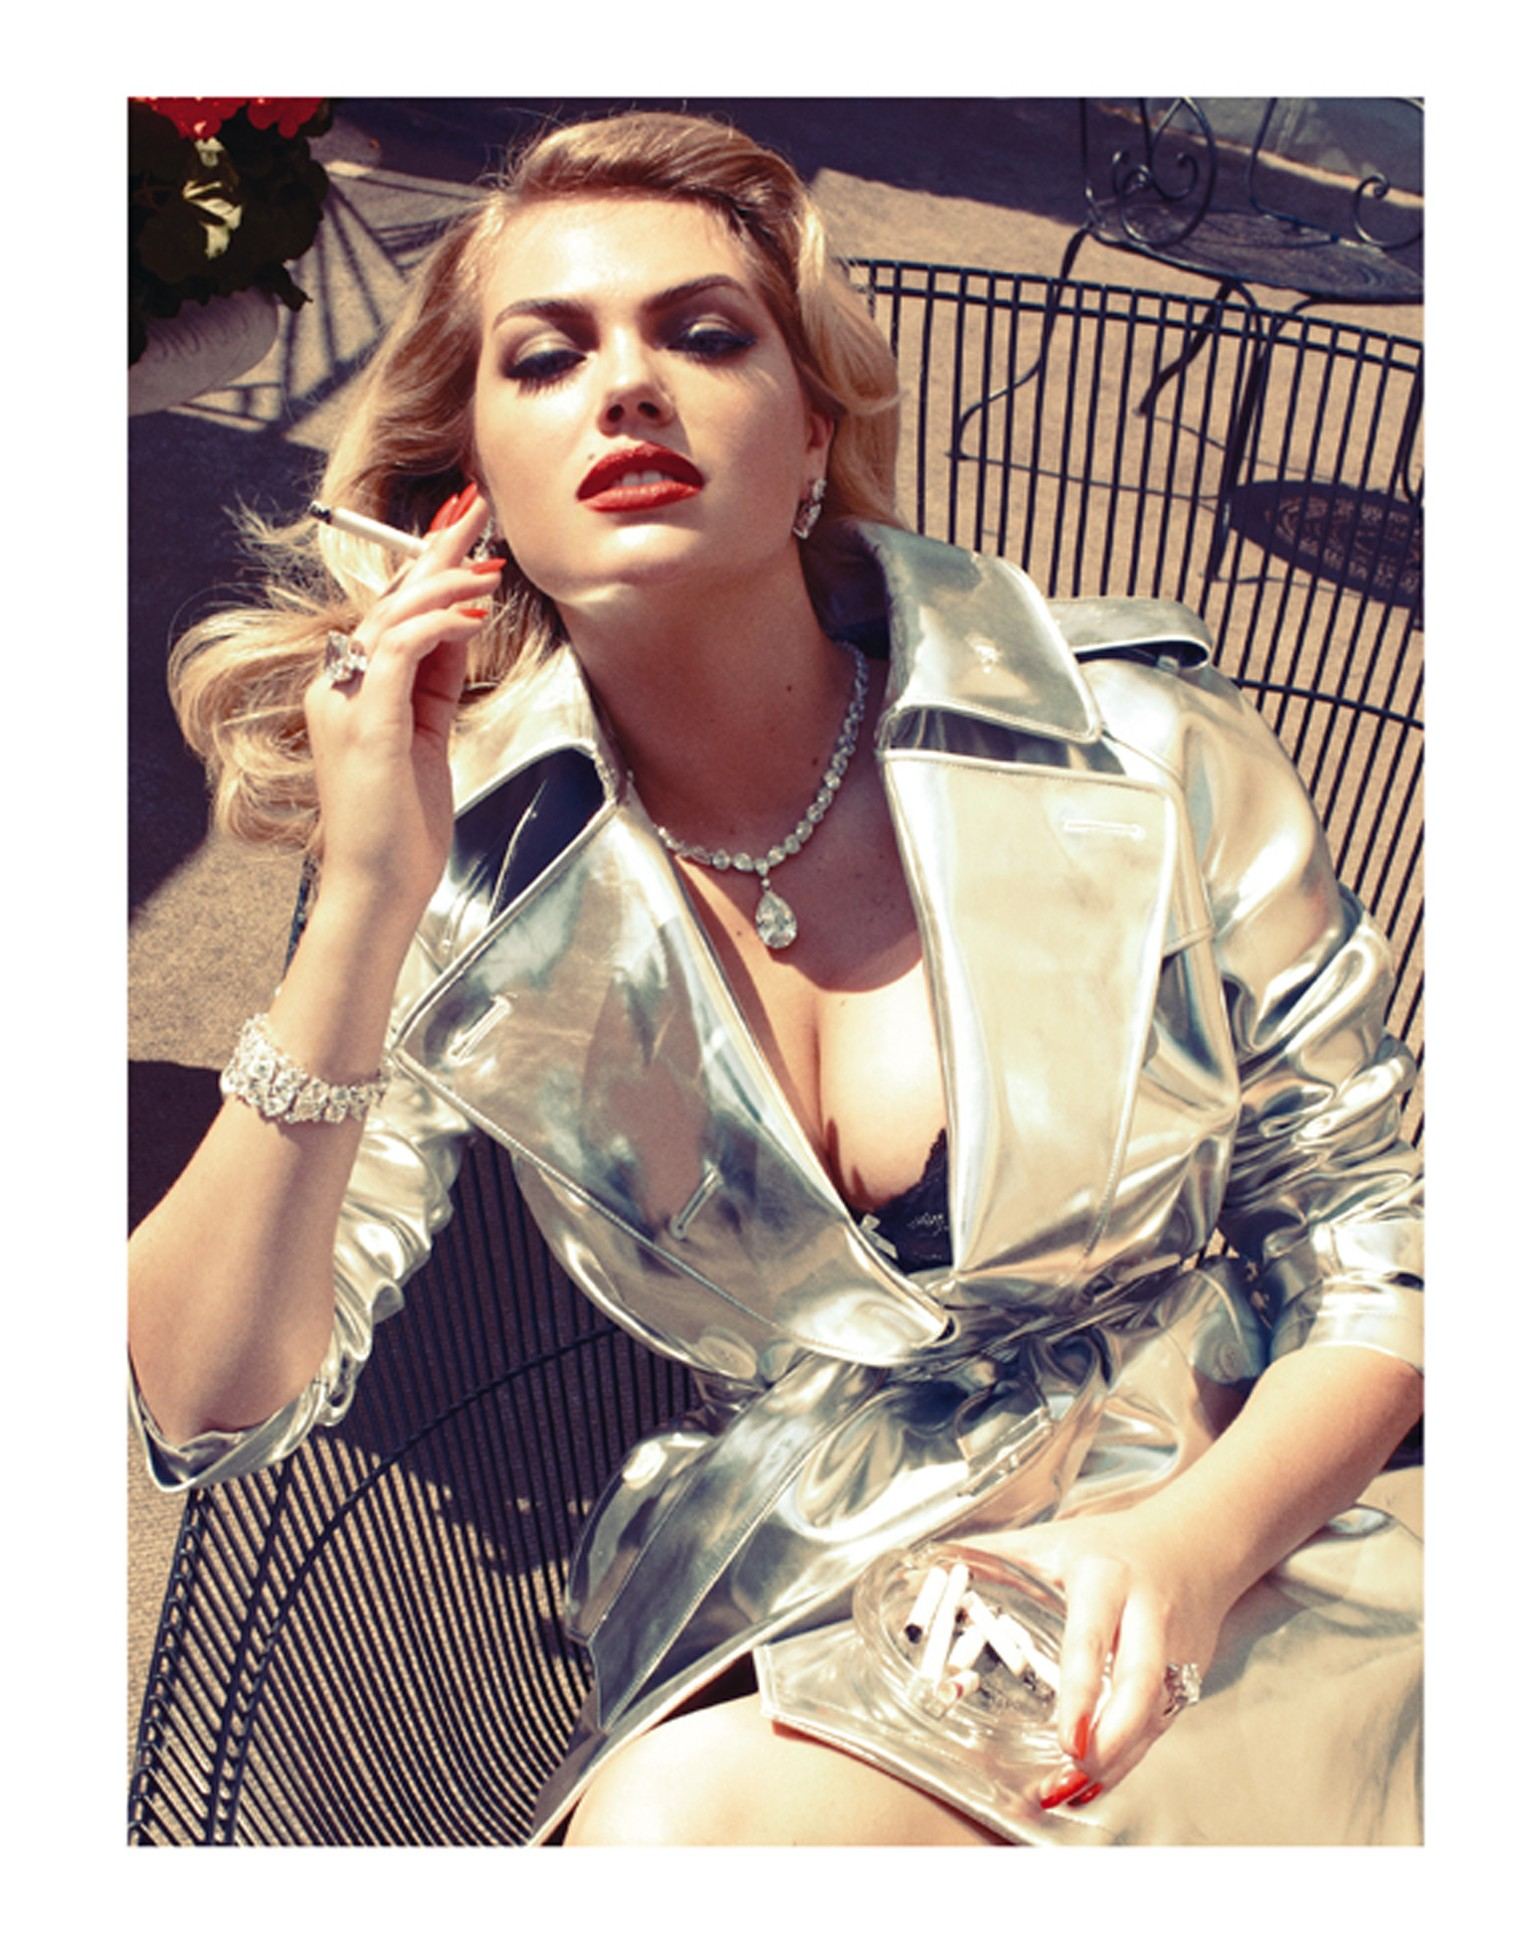 Kate Upton Vogue Italia 2012 - 2019 year